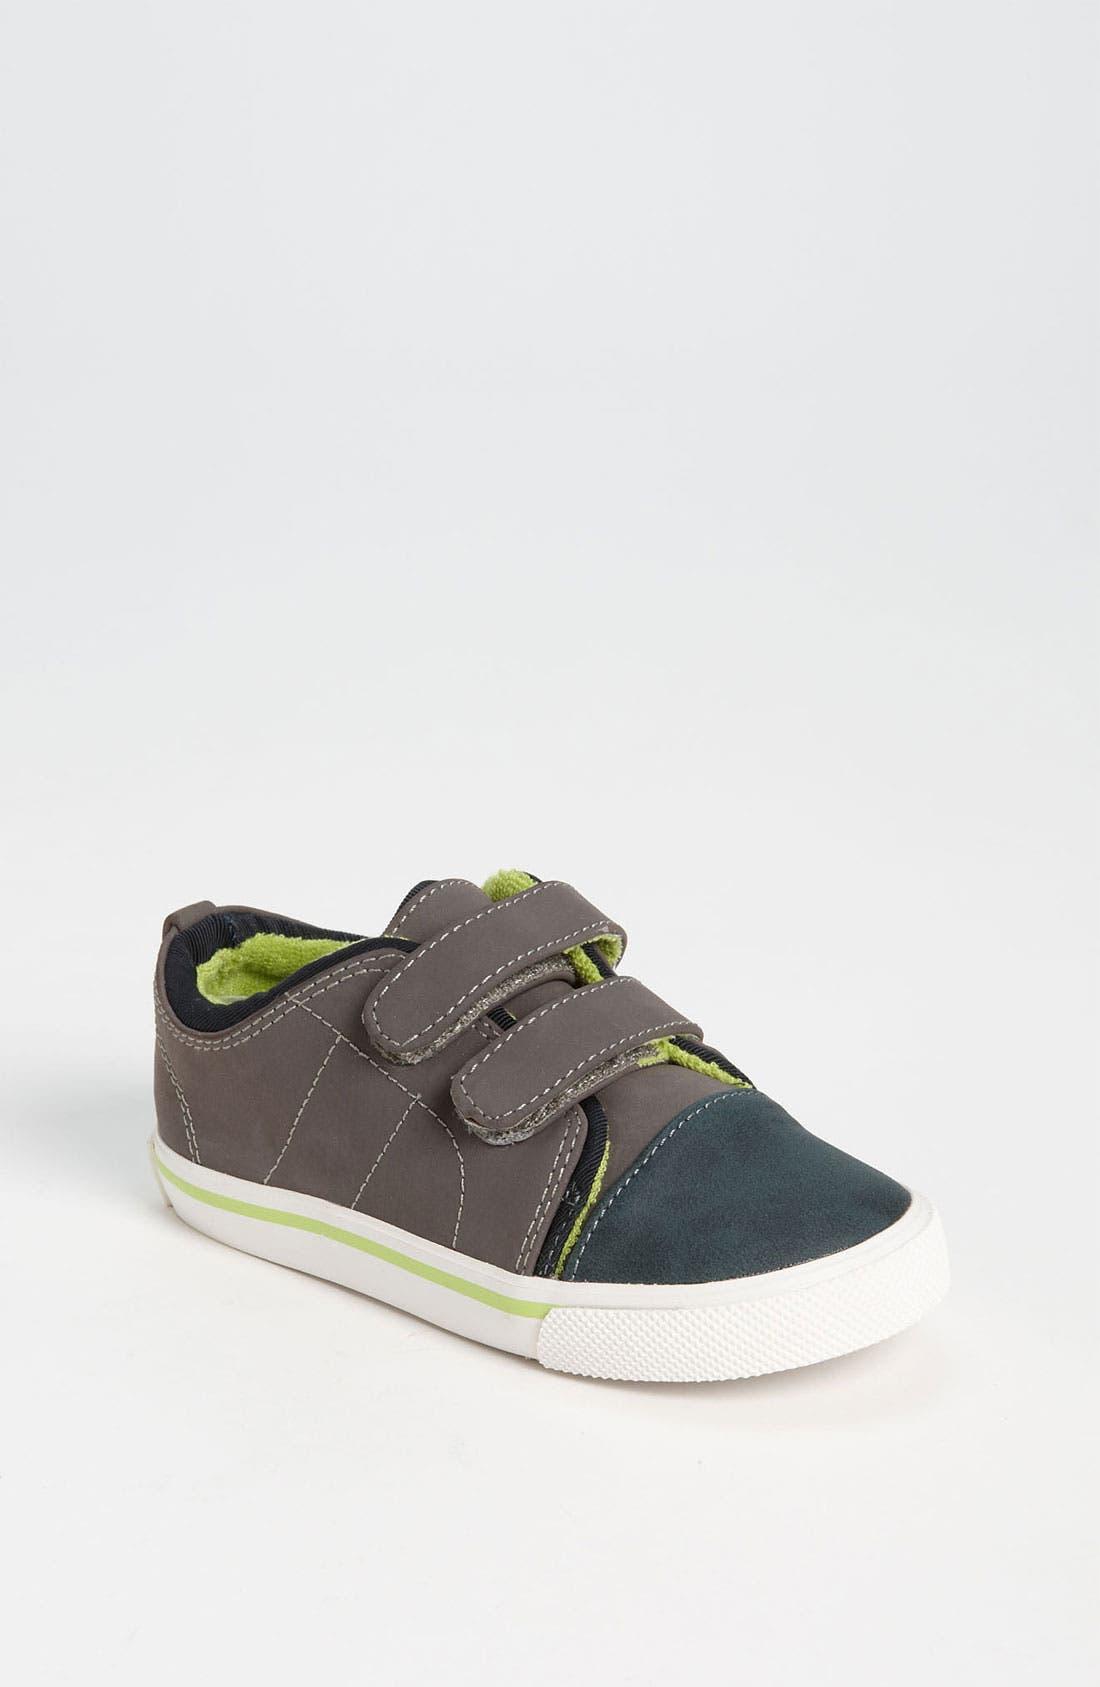 Alternate Image 1 Selected - Cole Haan 'Air Cory 2' Sneaker (Walker & Toddler)